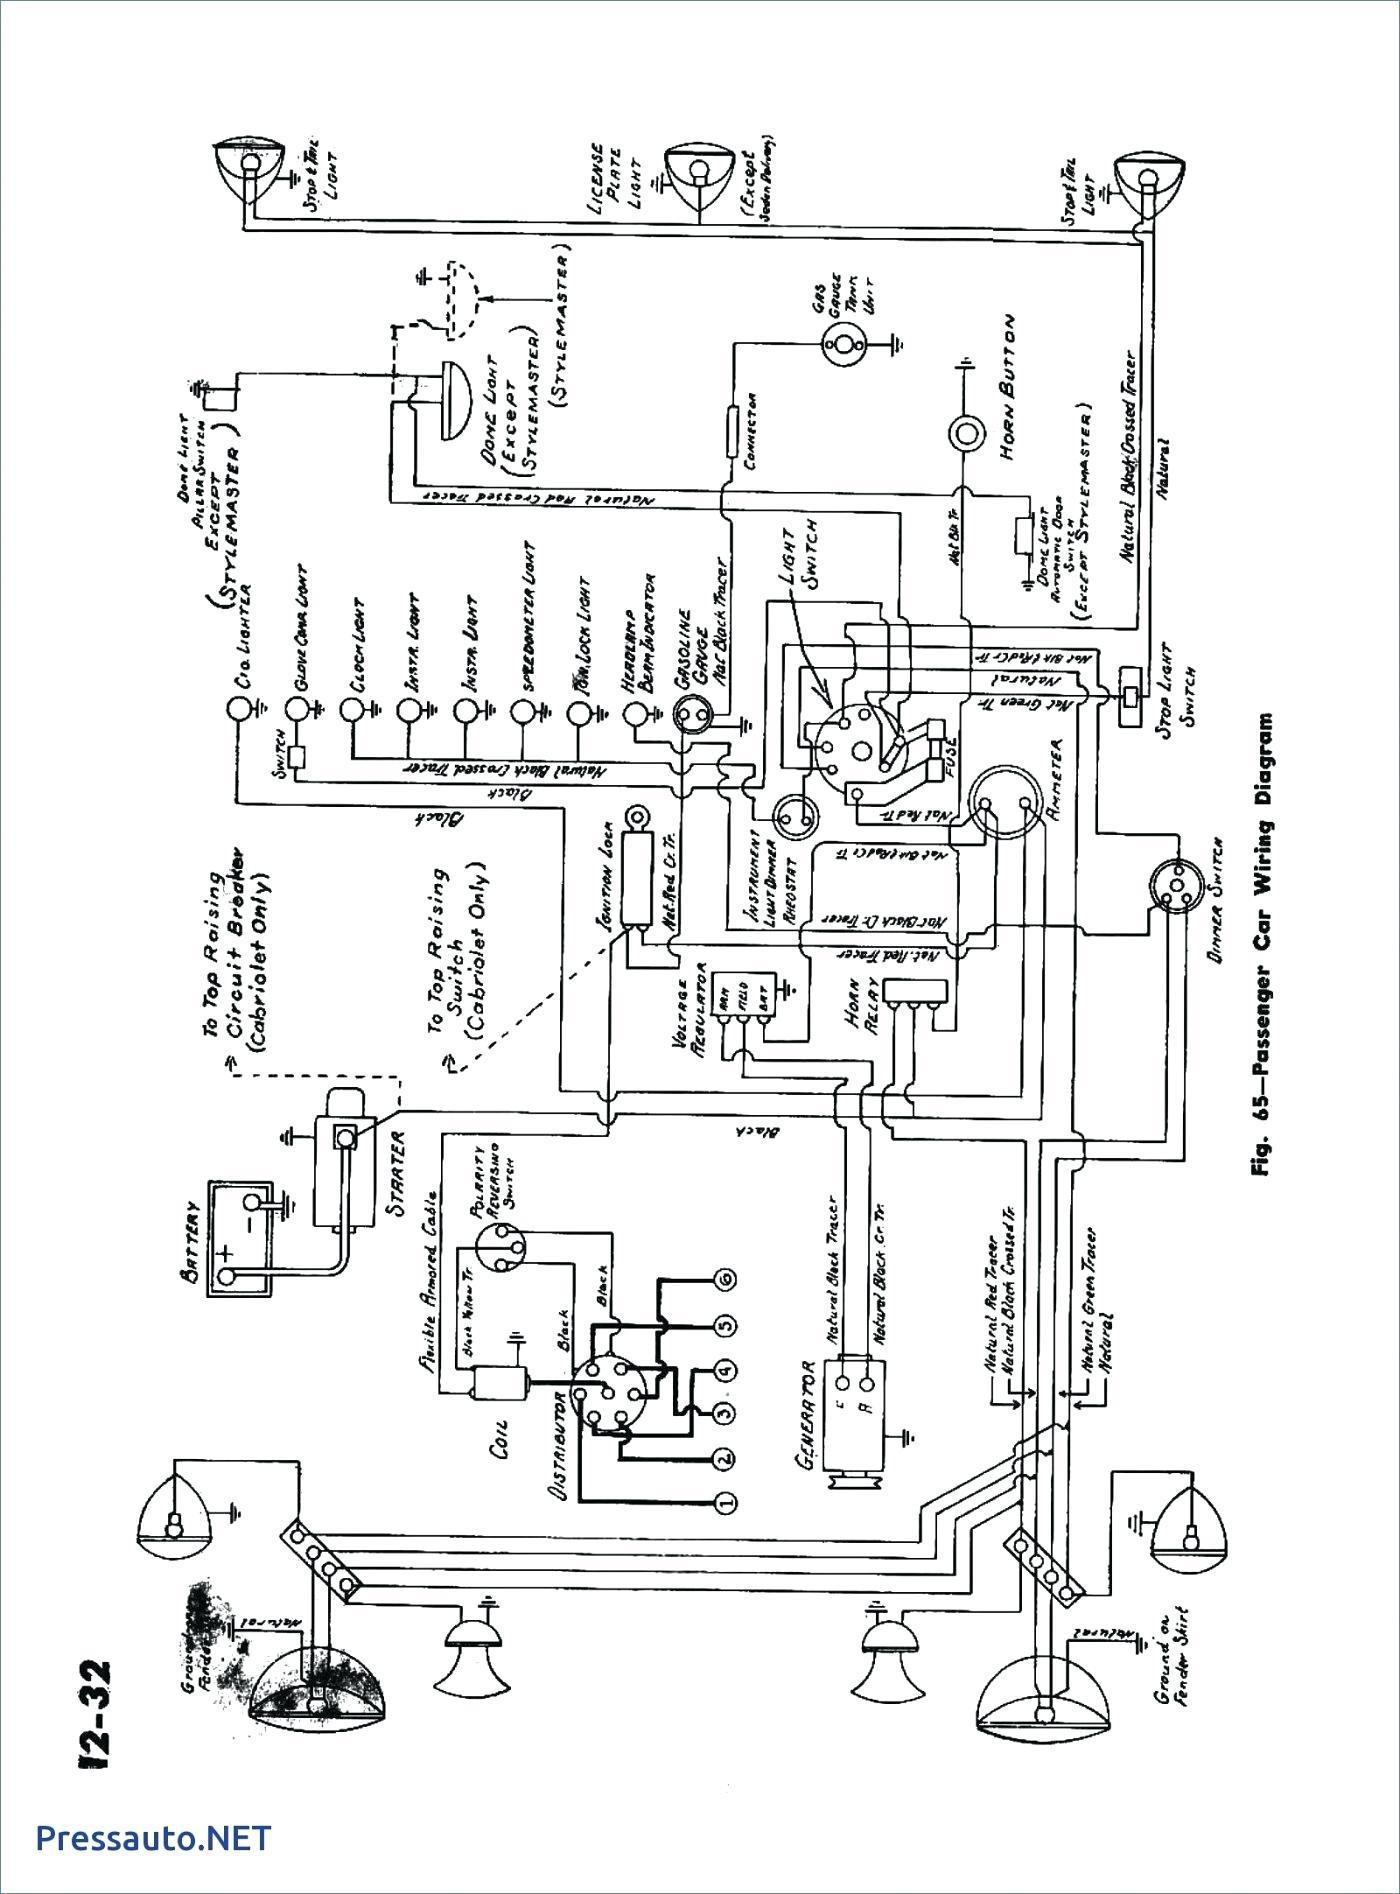 Ac Wiring Diagrams Automotive Library Aircraft Electrical Diagram Symbols